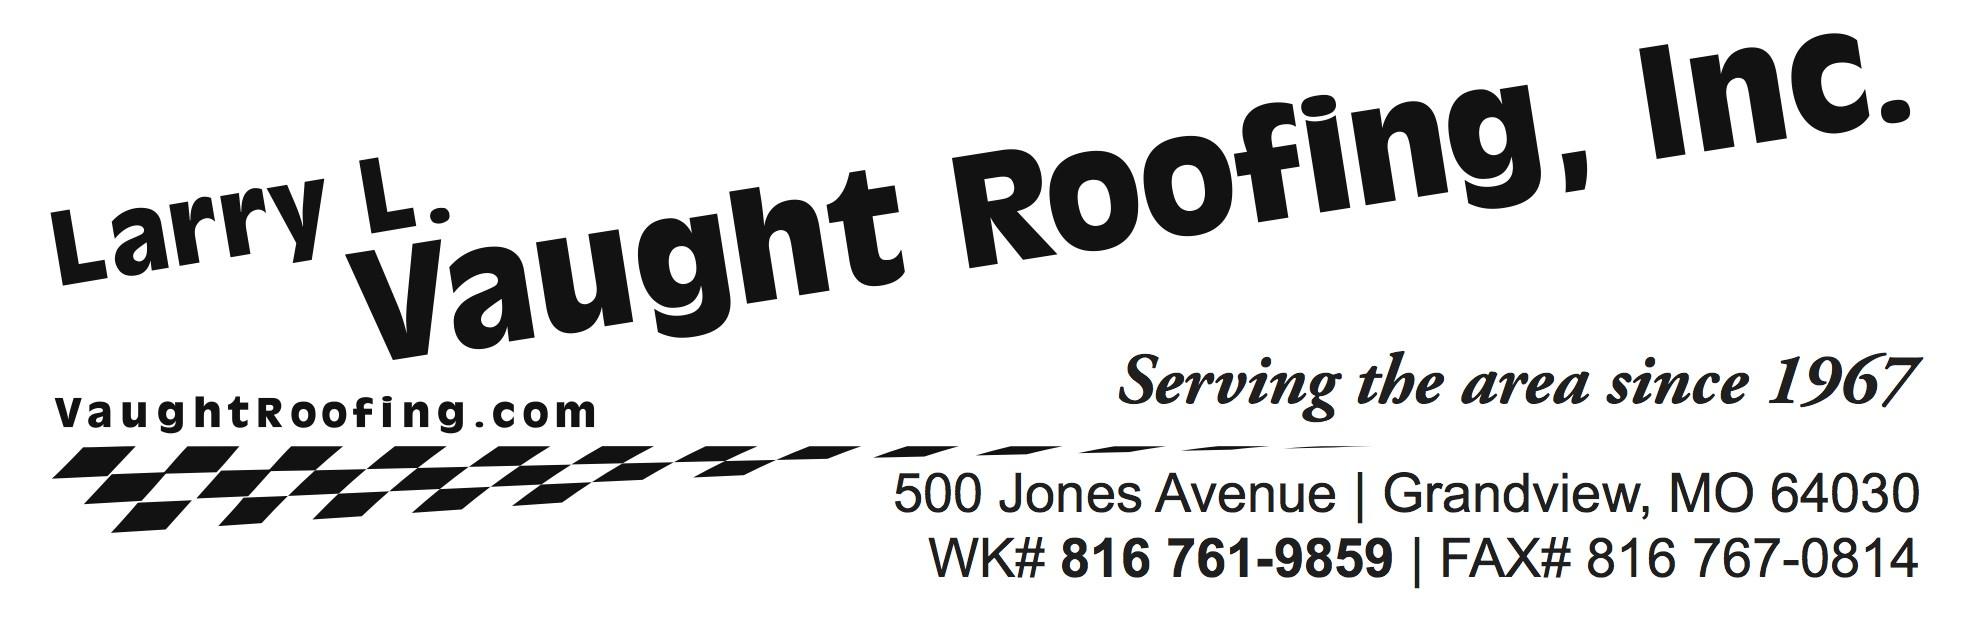 Larry L. Vaught Roofing Inc logo